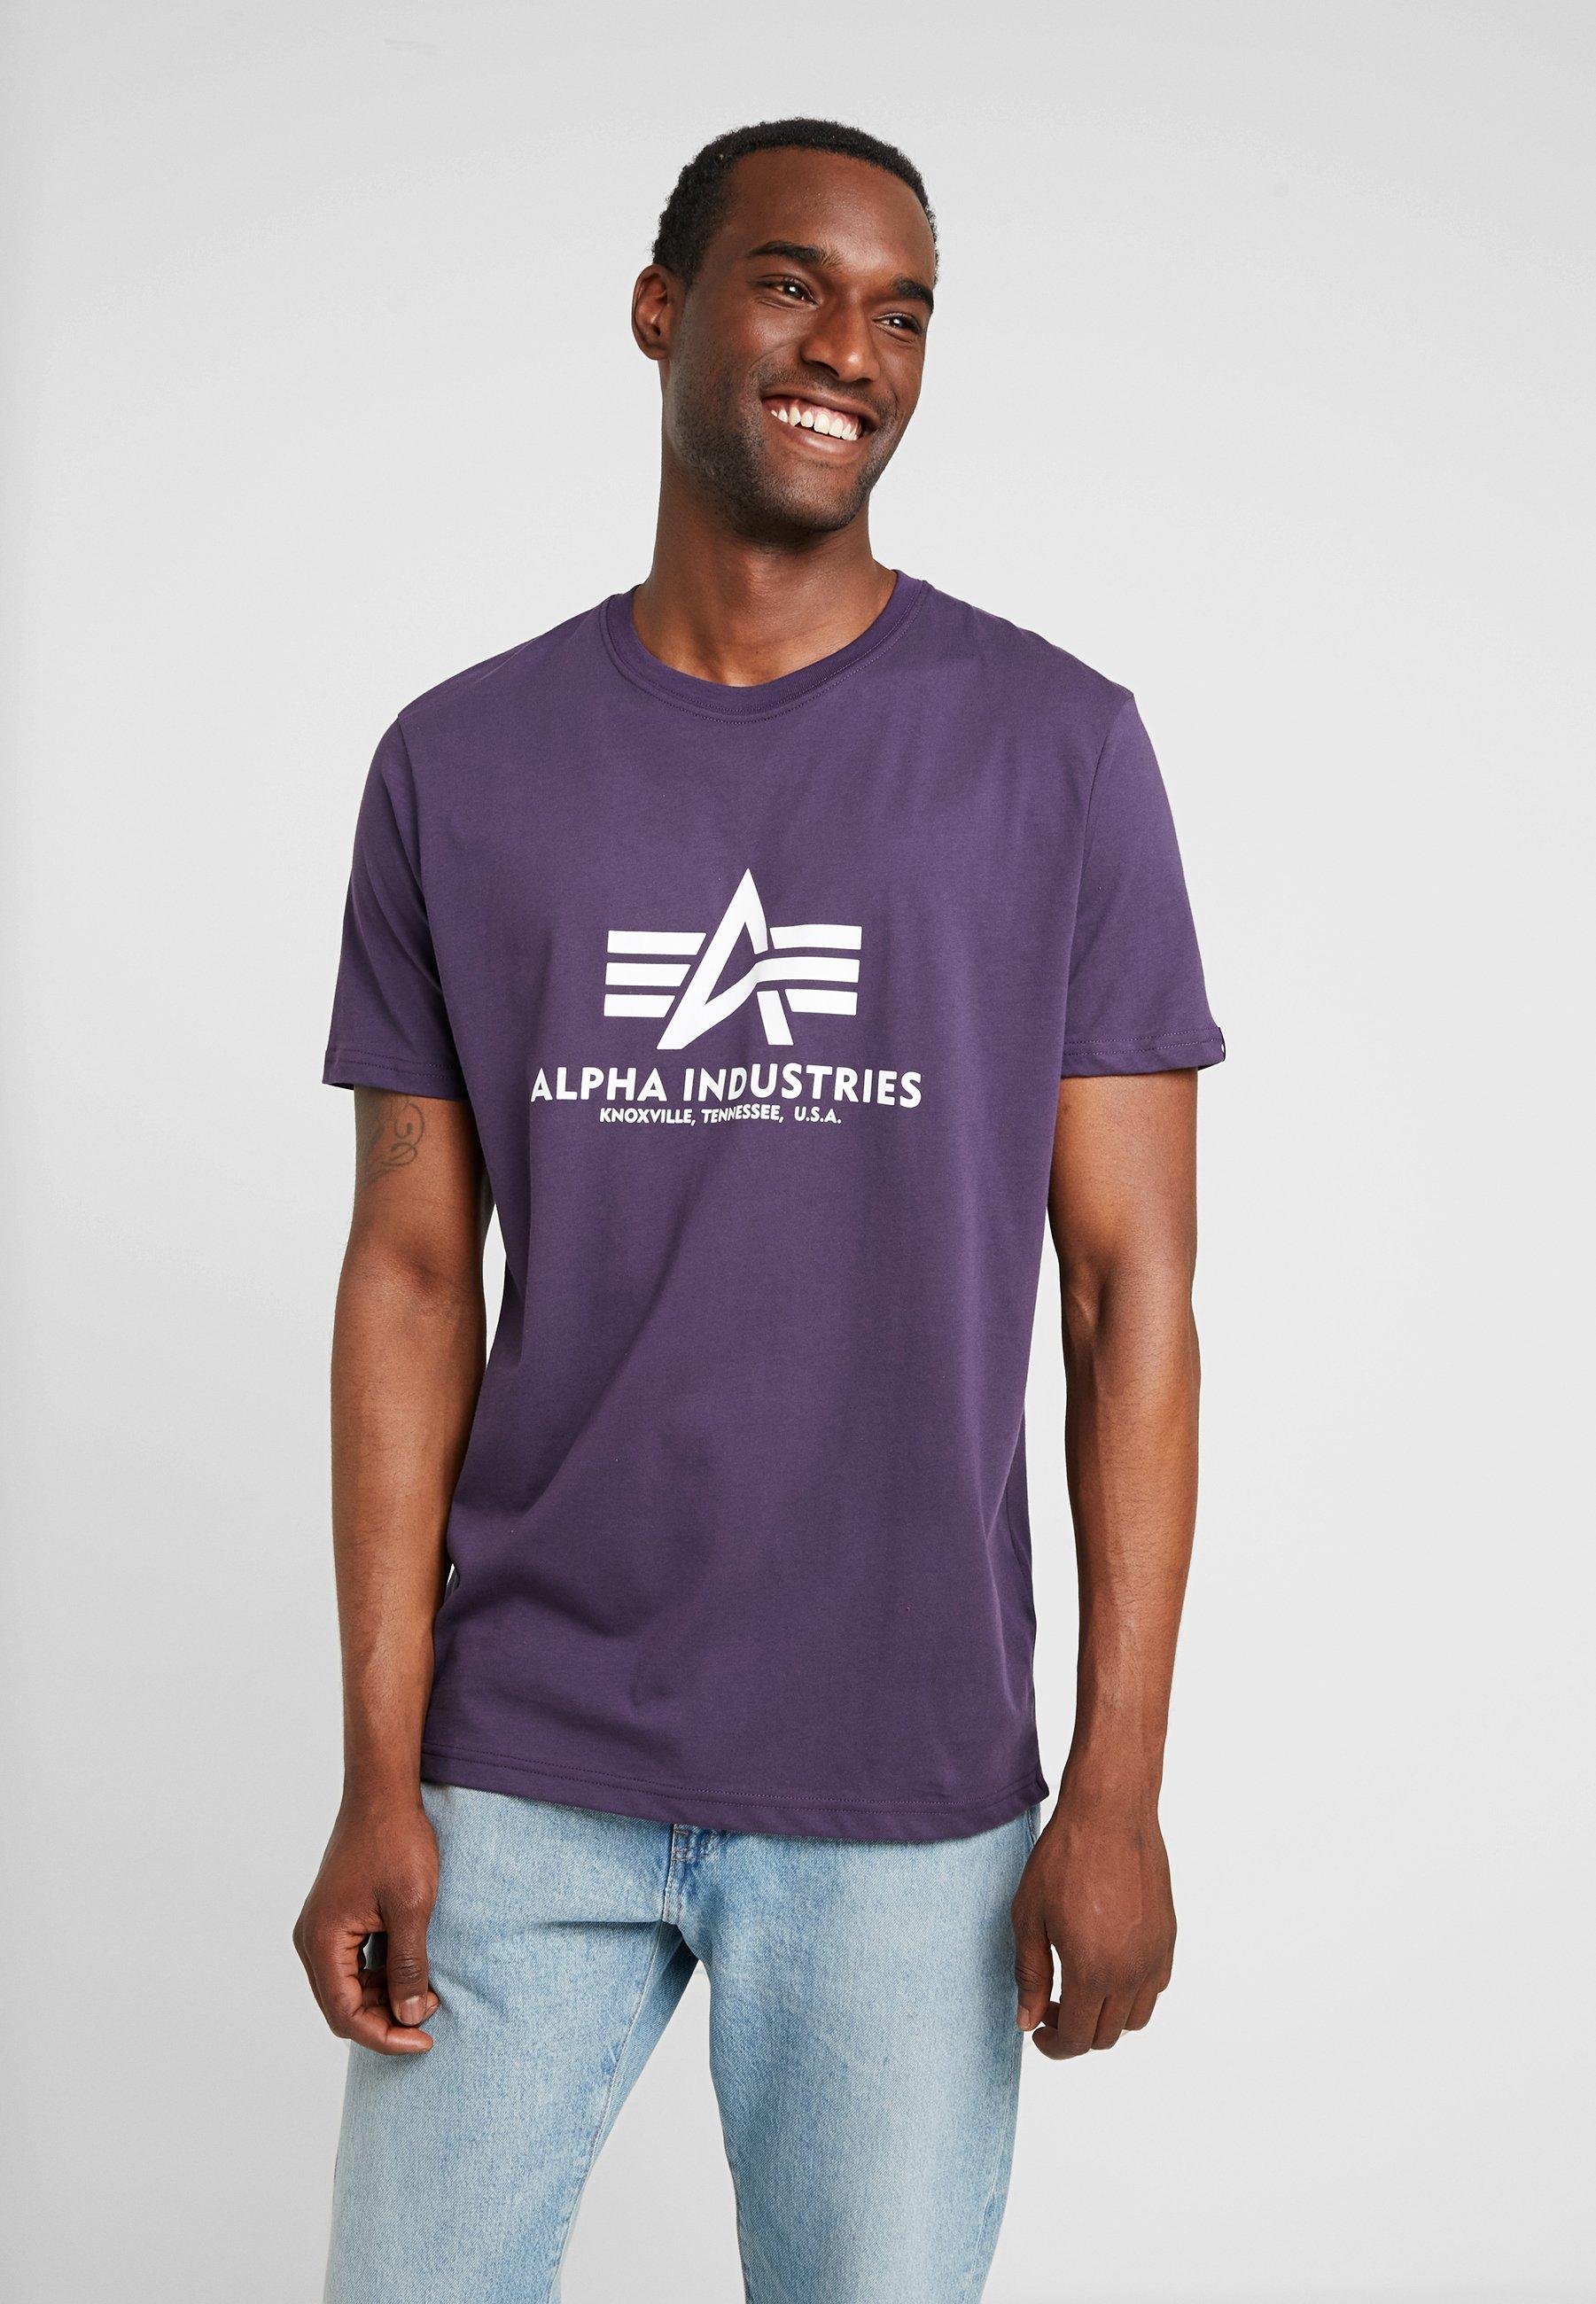 BasicT Nightshade Imprimé Alpha shirt Industries xhsrCQtd